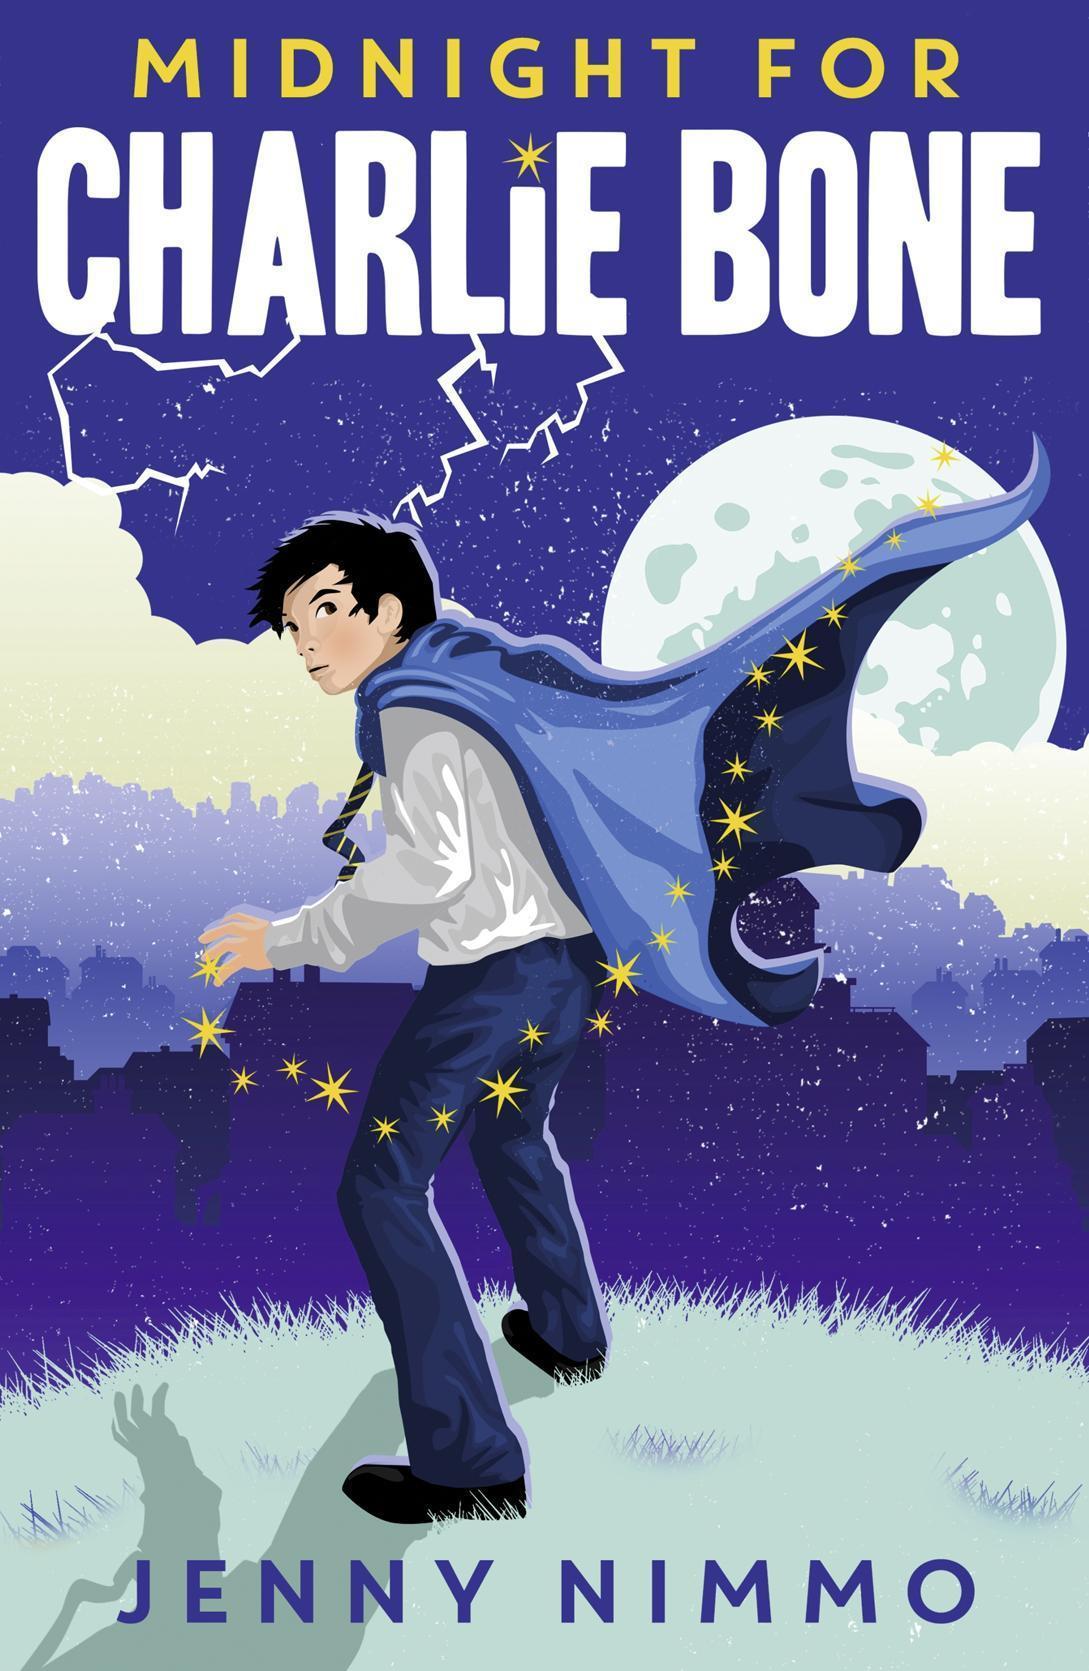 Charlie-Bone-Midnight-for-Charlie-Bone-Jenny-Nimmo